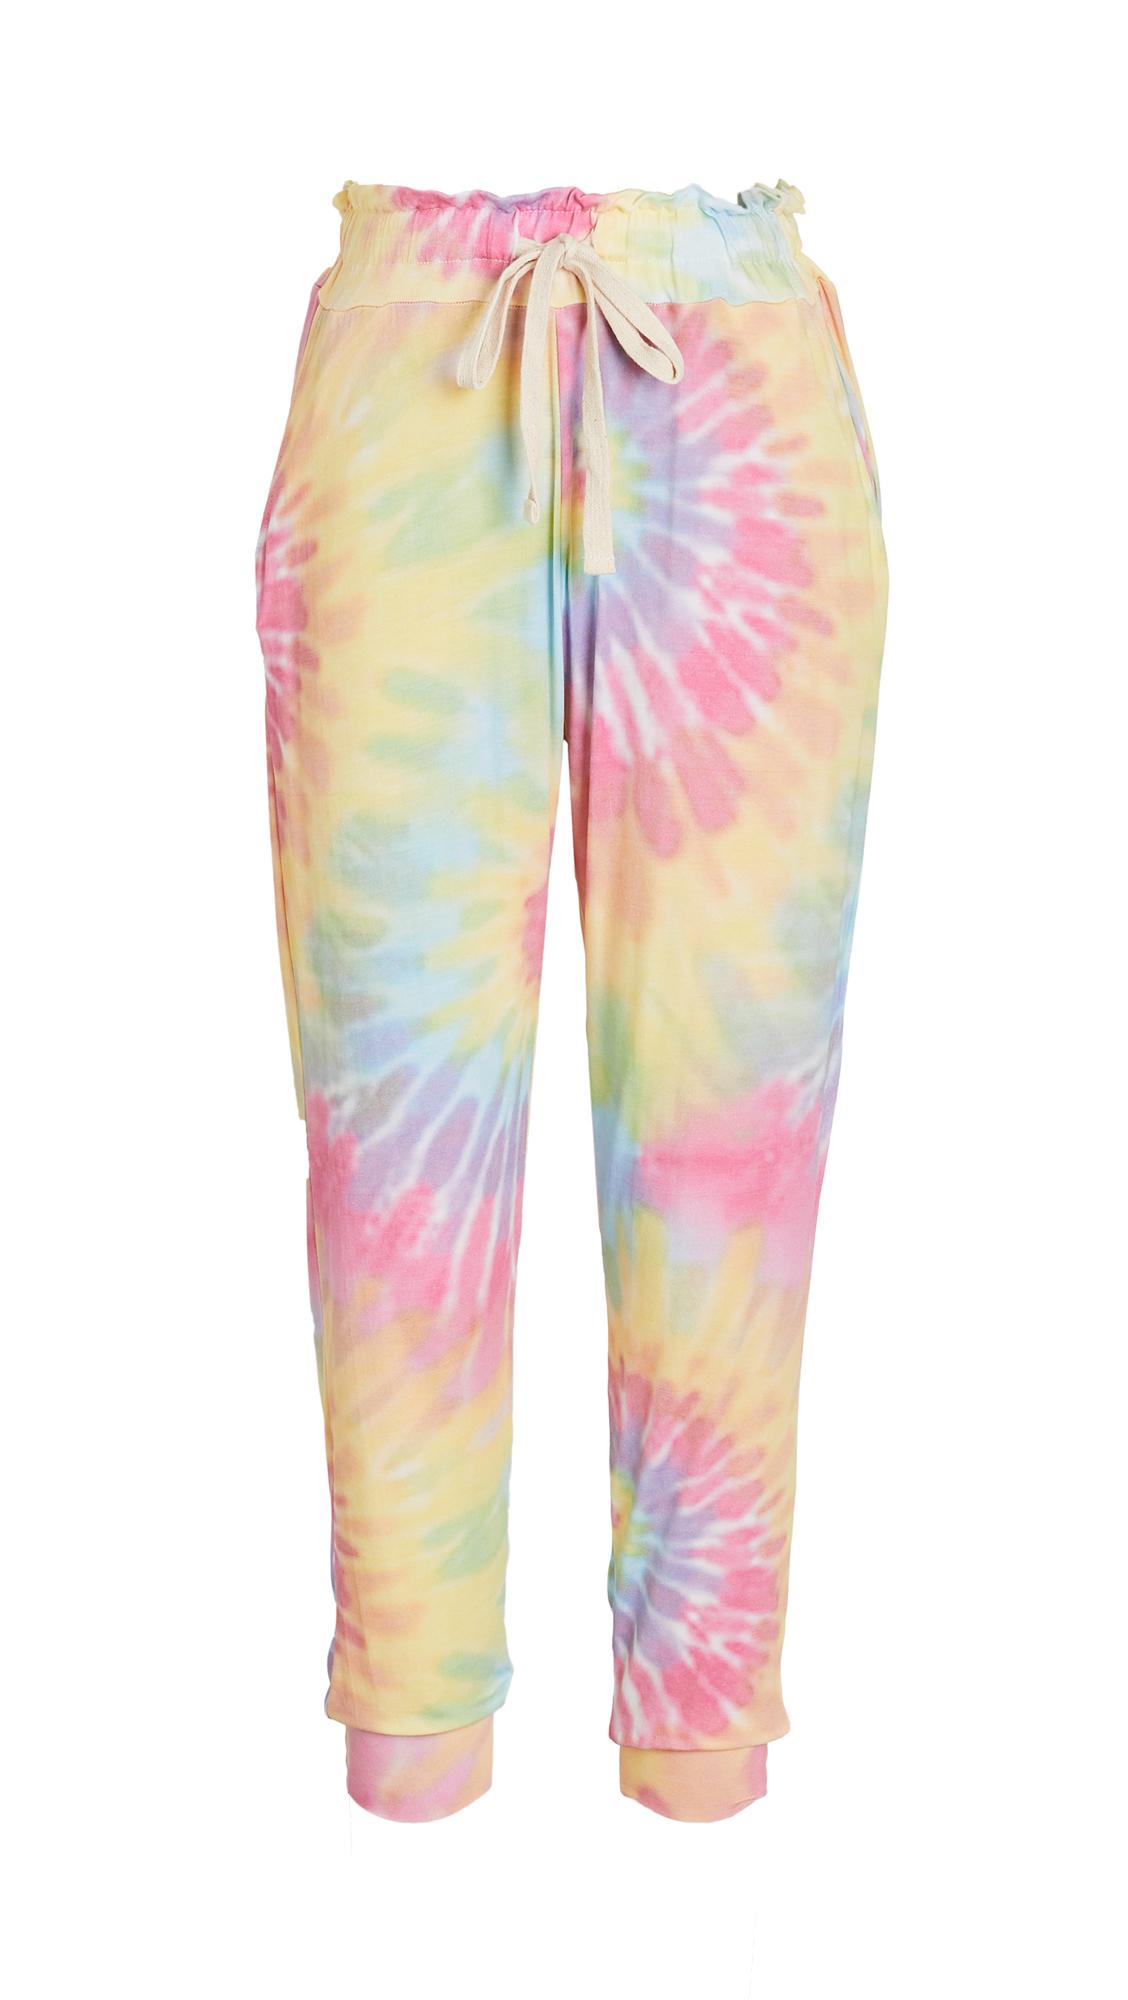 Stripe & Stare Tie Dye Lounge Pants